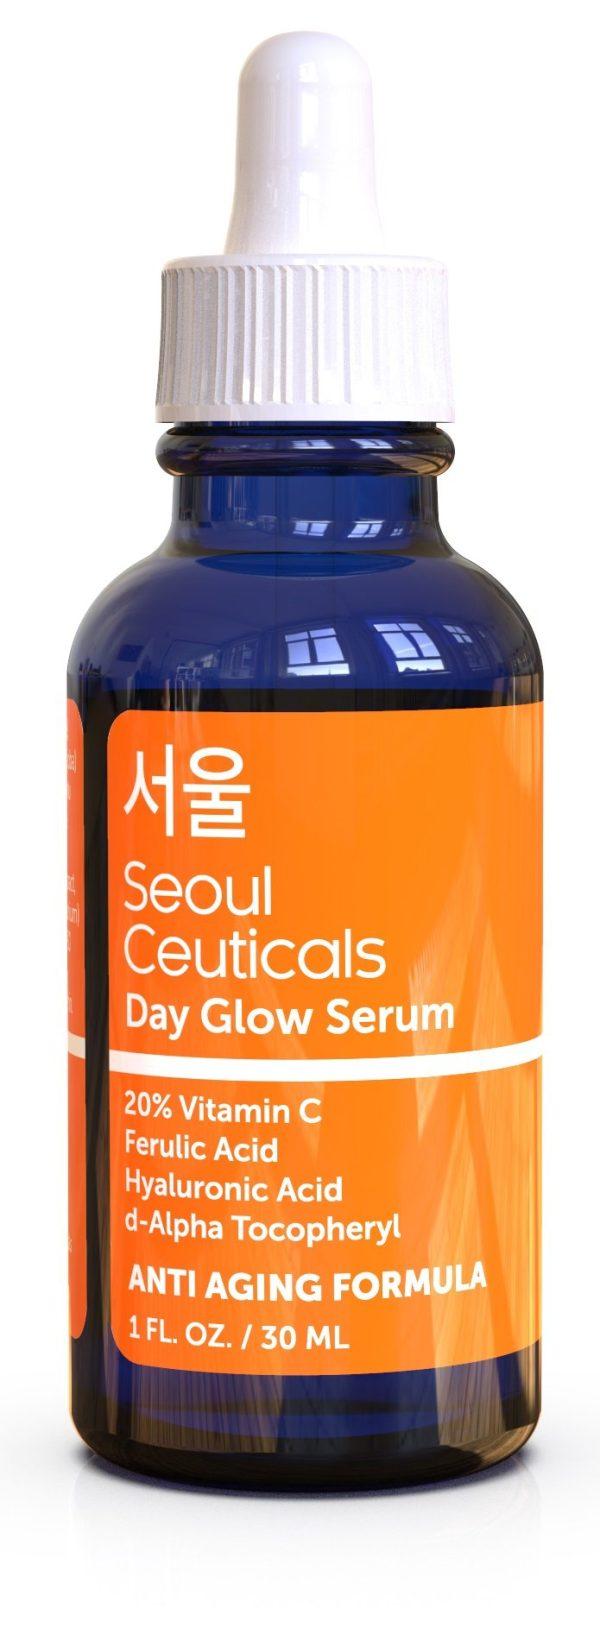 Korean Skin Care K Beauty - 20% Vitamin C Hyaluronic Acid Serum + CE Ferulic Acid Provides Potent Anti Aging, Anti Wrinkle Korean Beauty 1oz